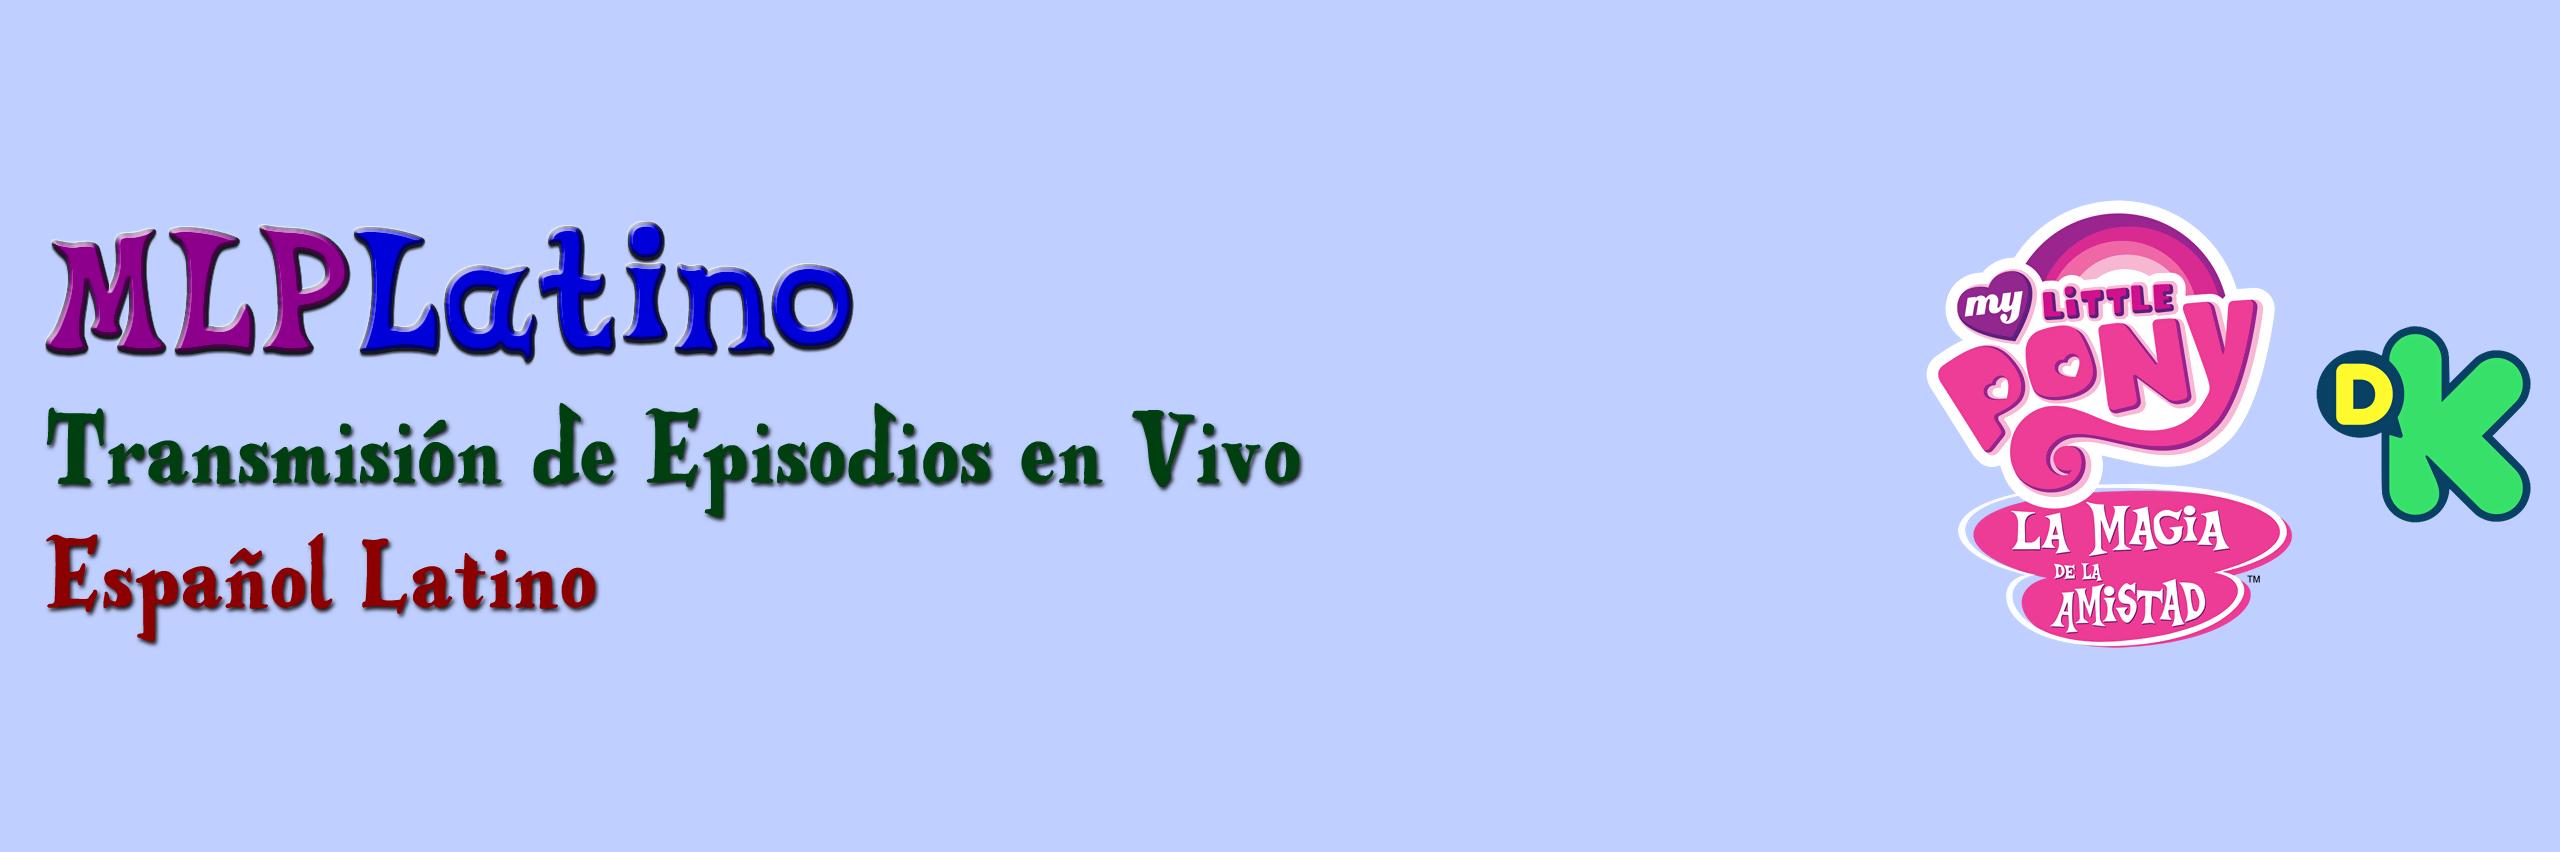 MLP Latino